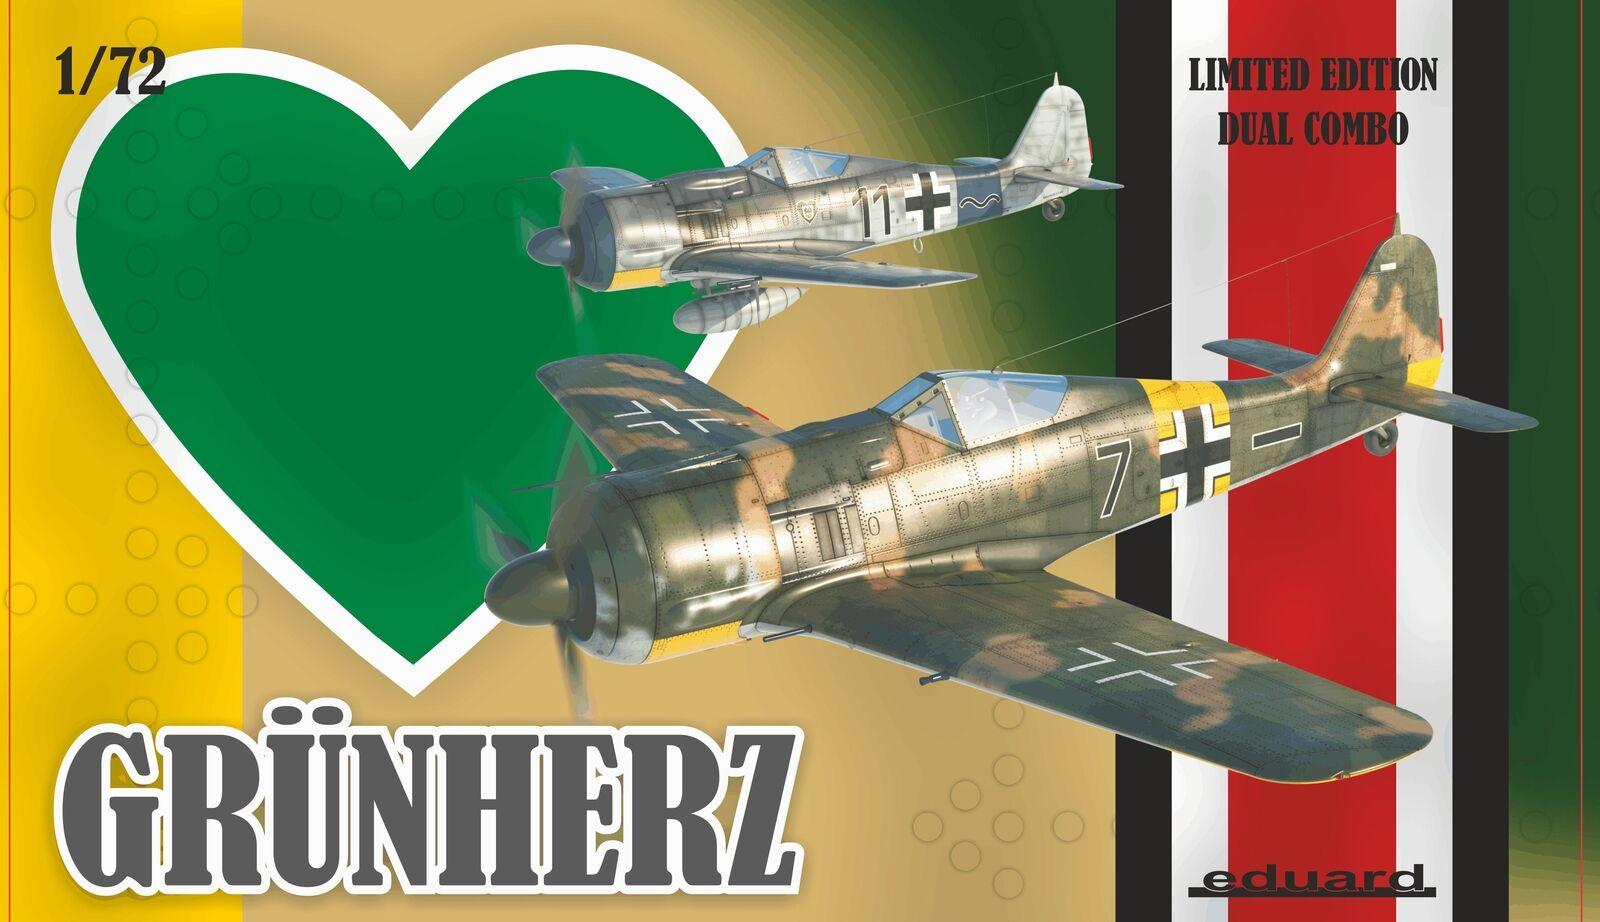 Eduard 1 72 Grun Herz Limited Edition Dual Combo K2122